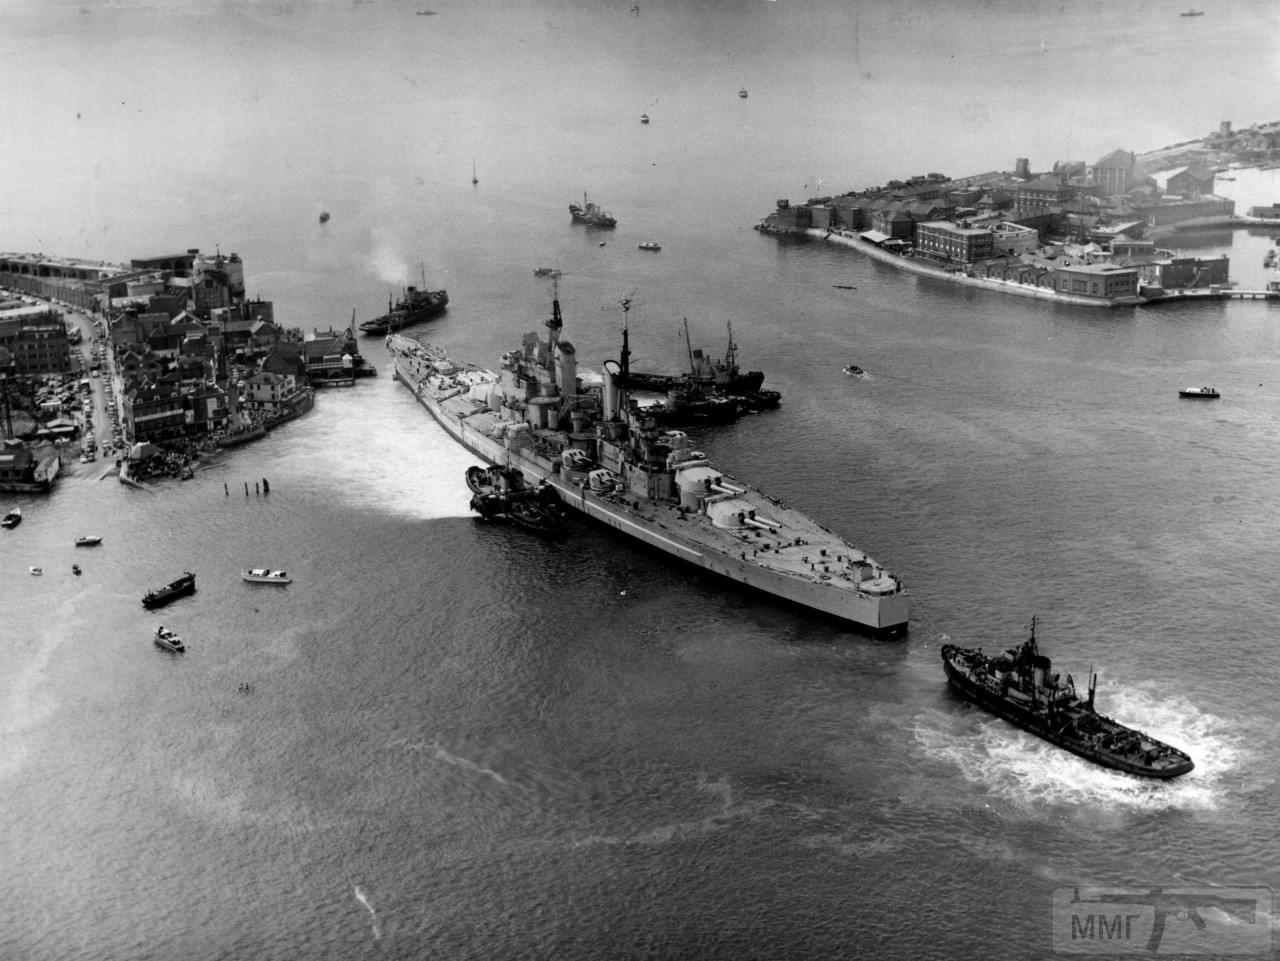 43720 - HMS Vanguard